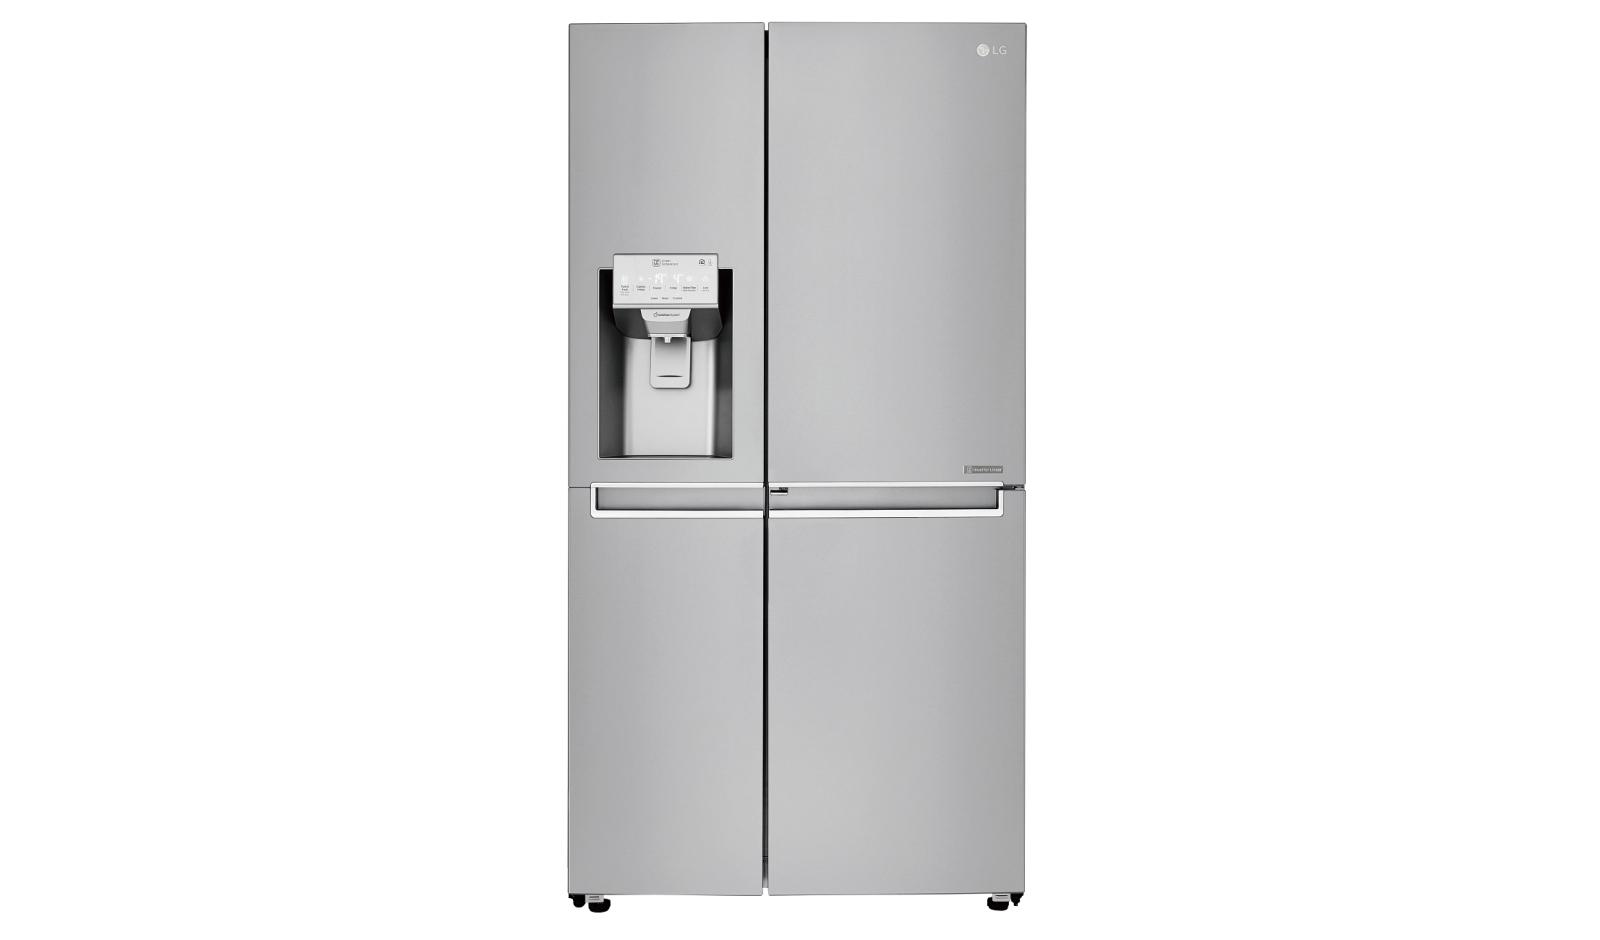 LG frižider kombinovani GSJ960NSBZ - Inelektronik